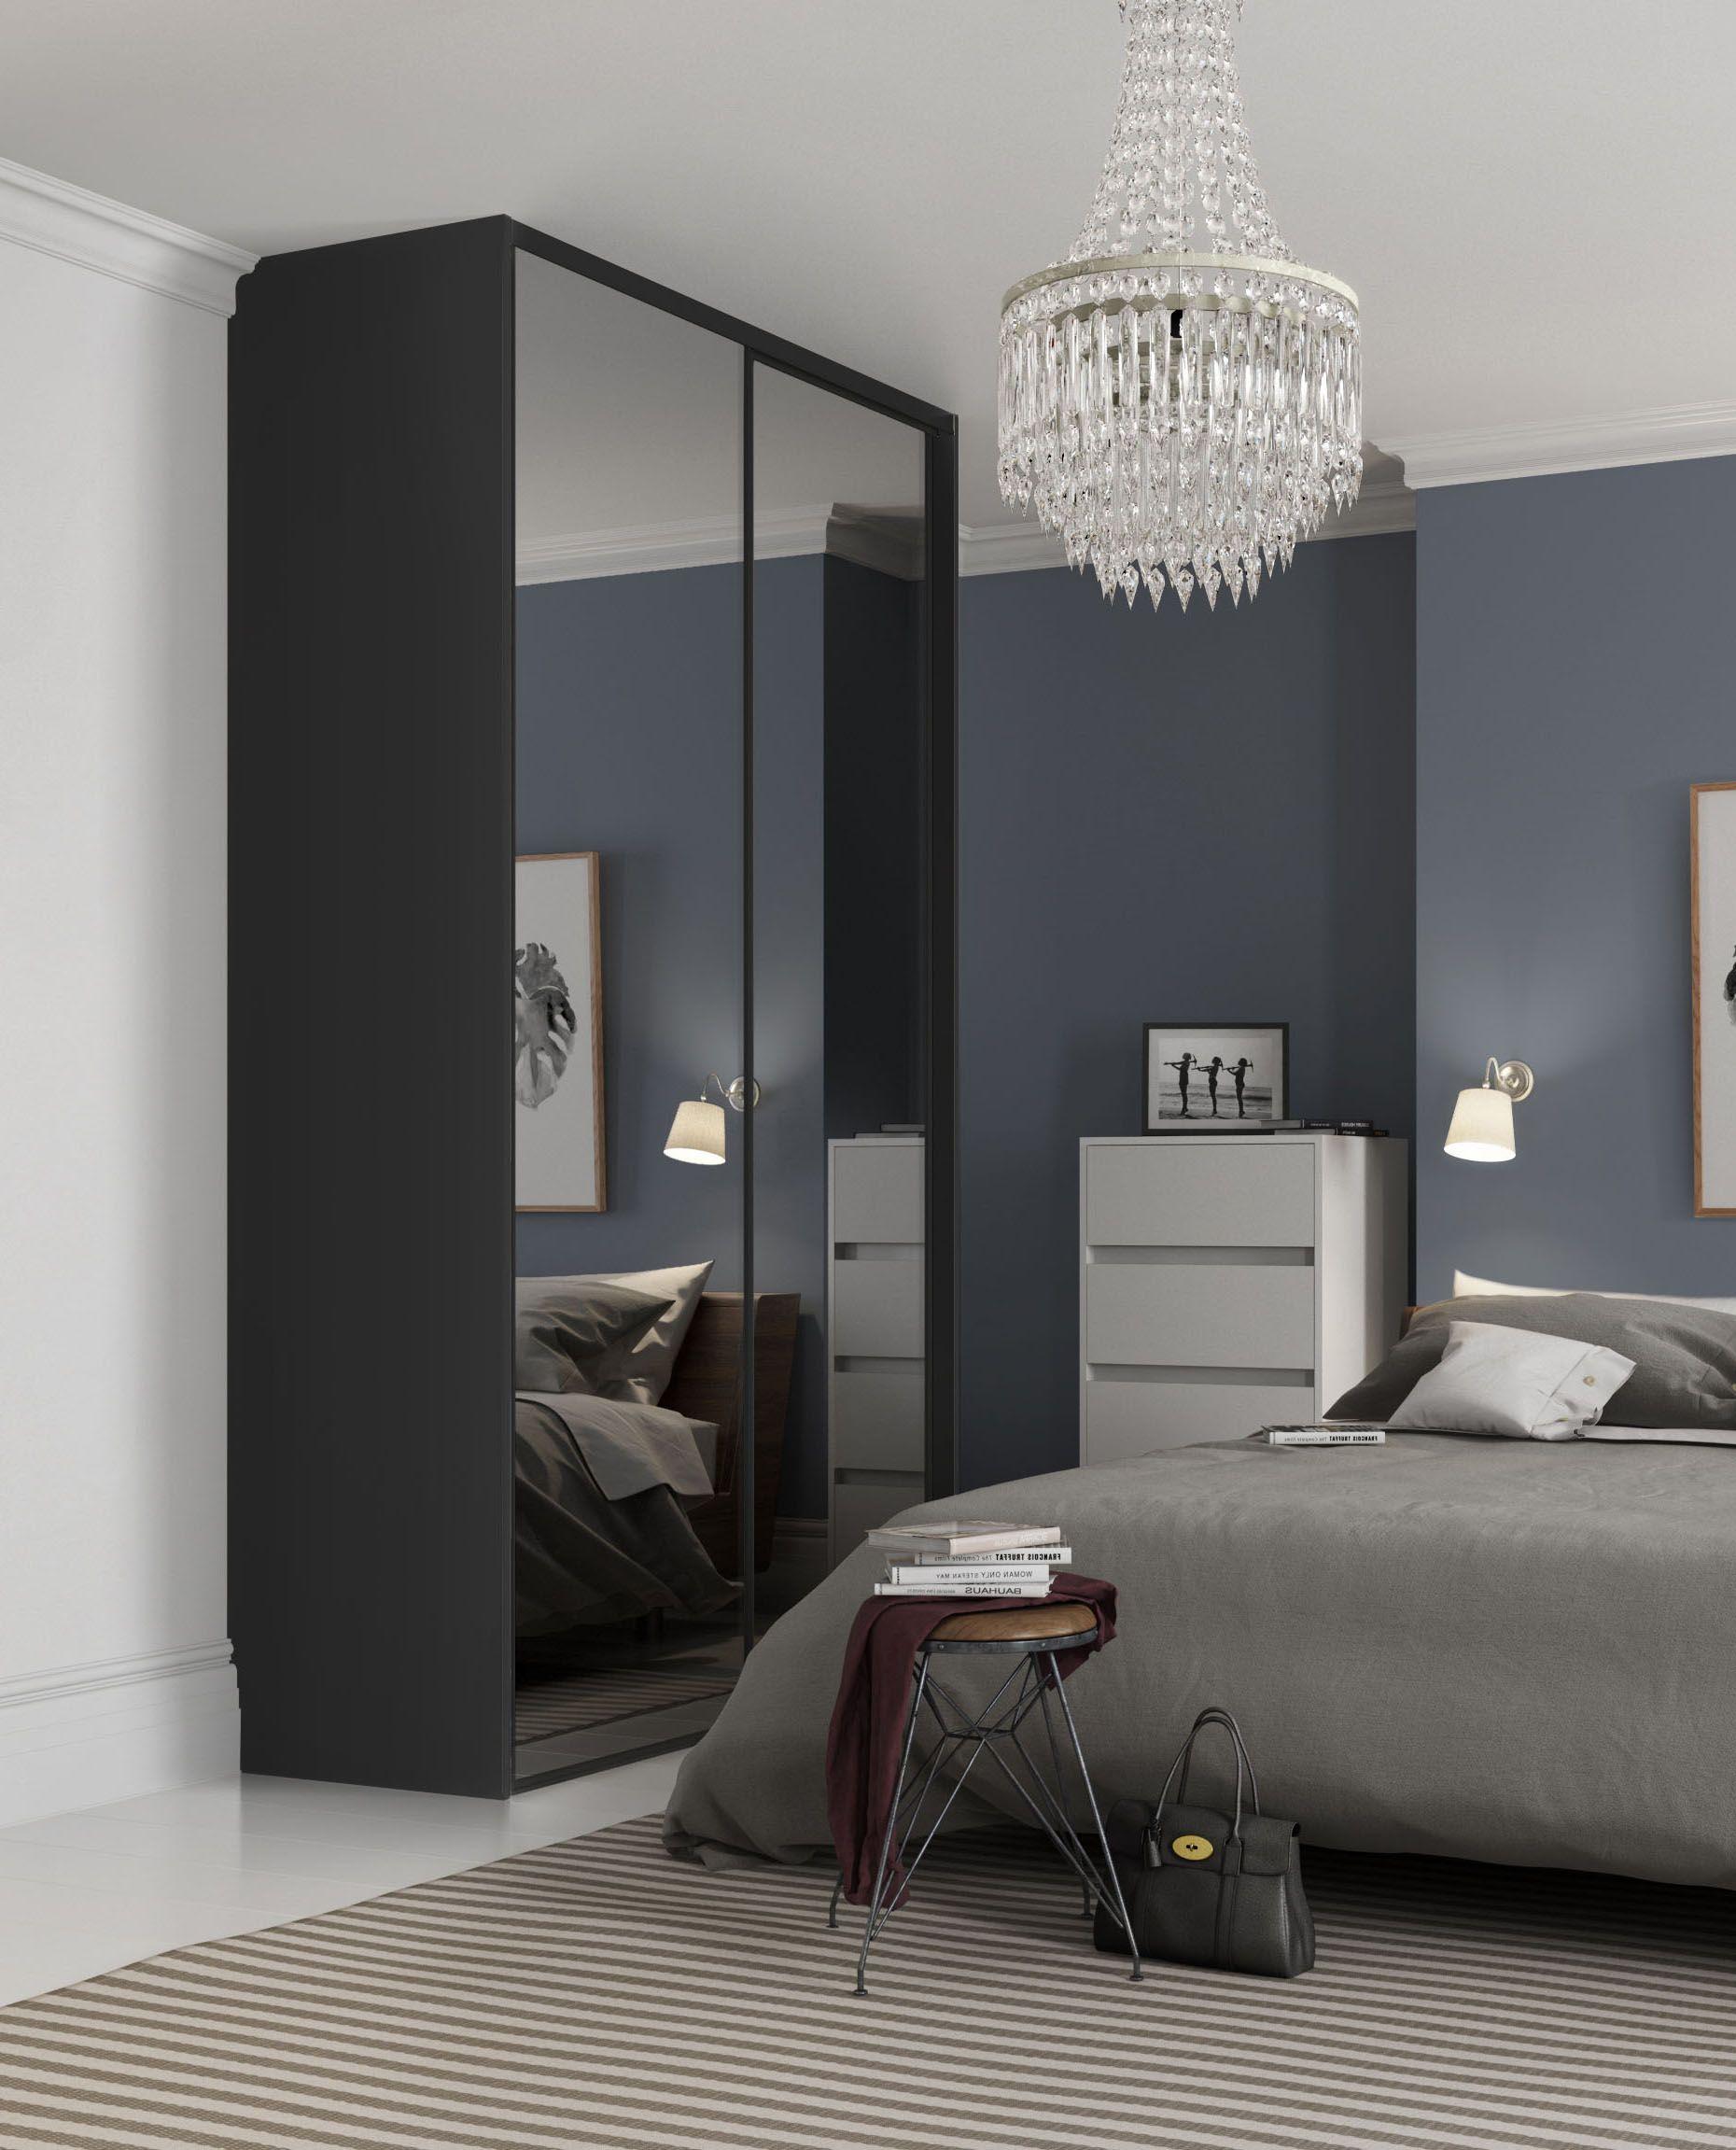 Cheap Bedroom Design Ideas Sliding Door Wardrobes: Wardrobe Chennai... #wardrobe #wardrobes #wardrobedesign